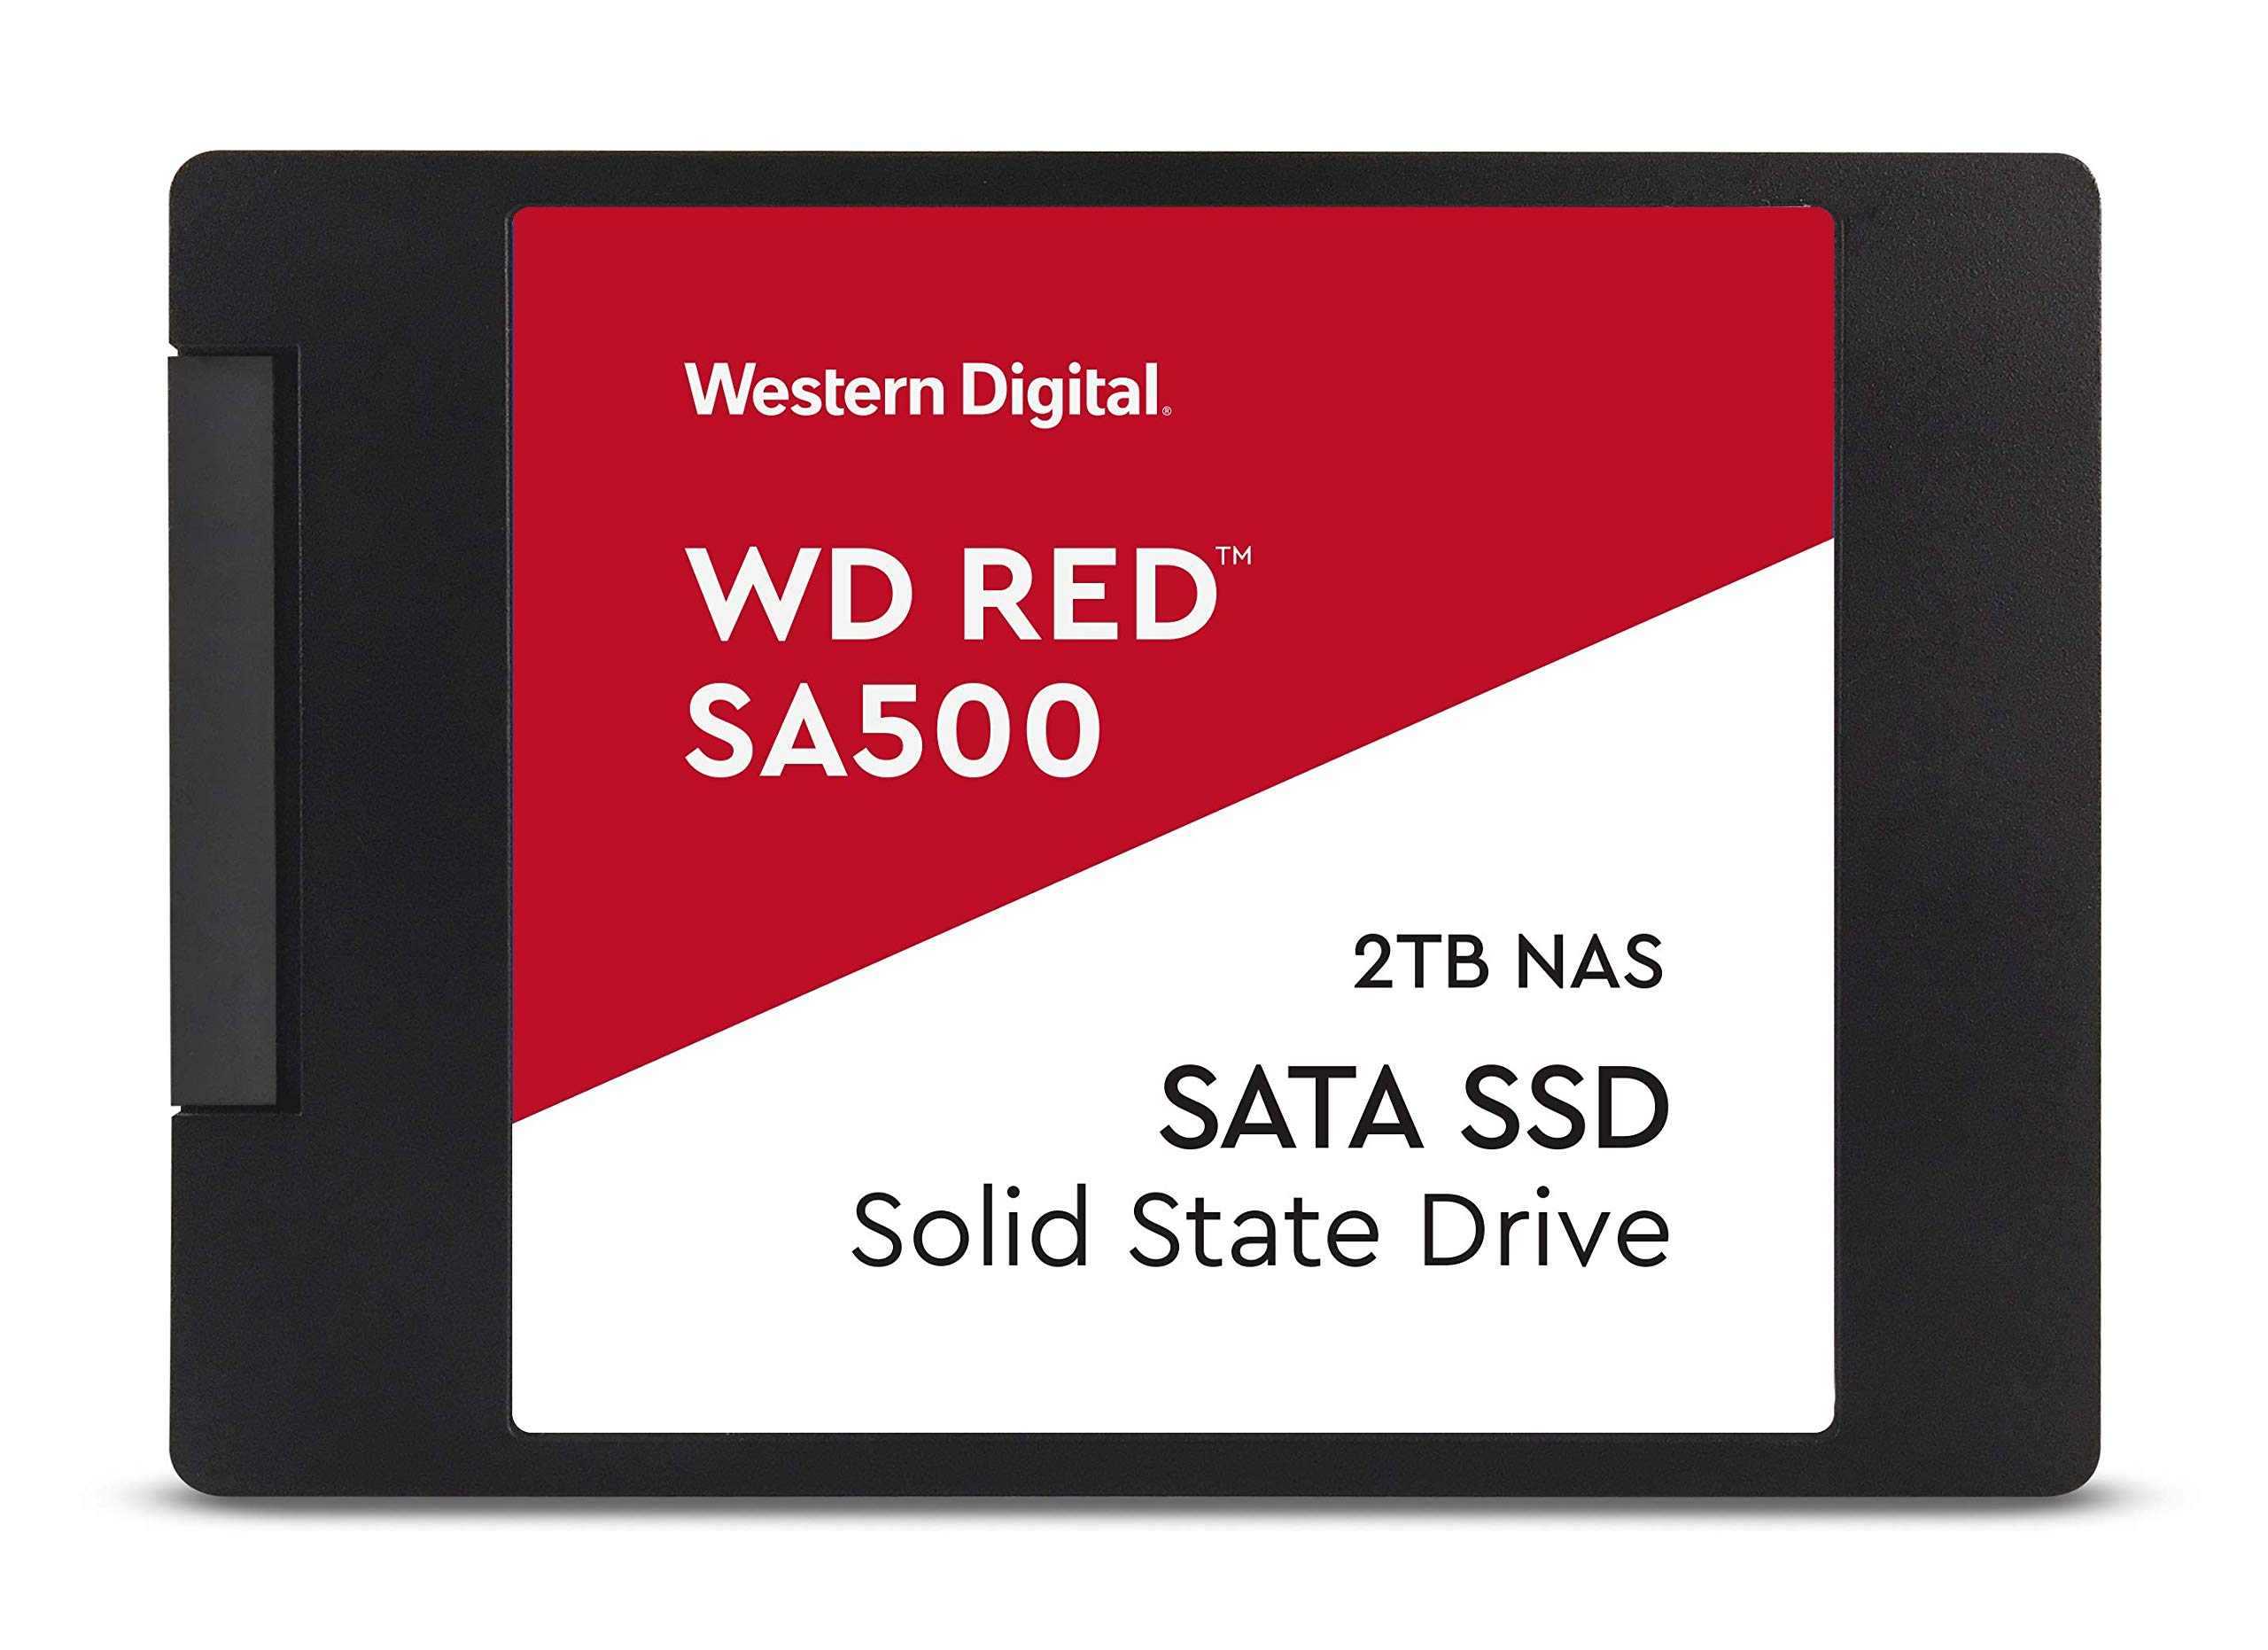 SSD 2TB SATA WD Red SA500 NAS 2TB 3D NAND 6 GB/S 2.5/7mm Up